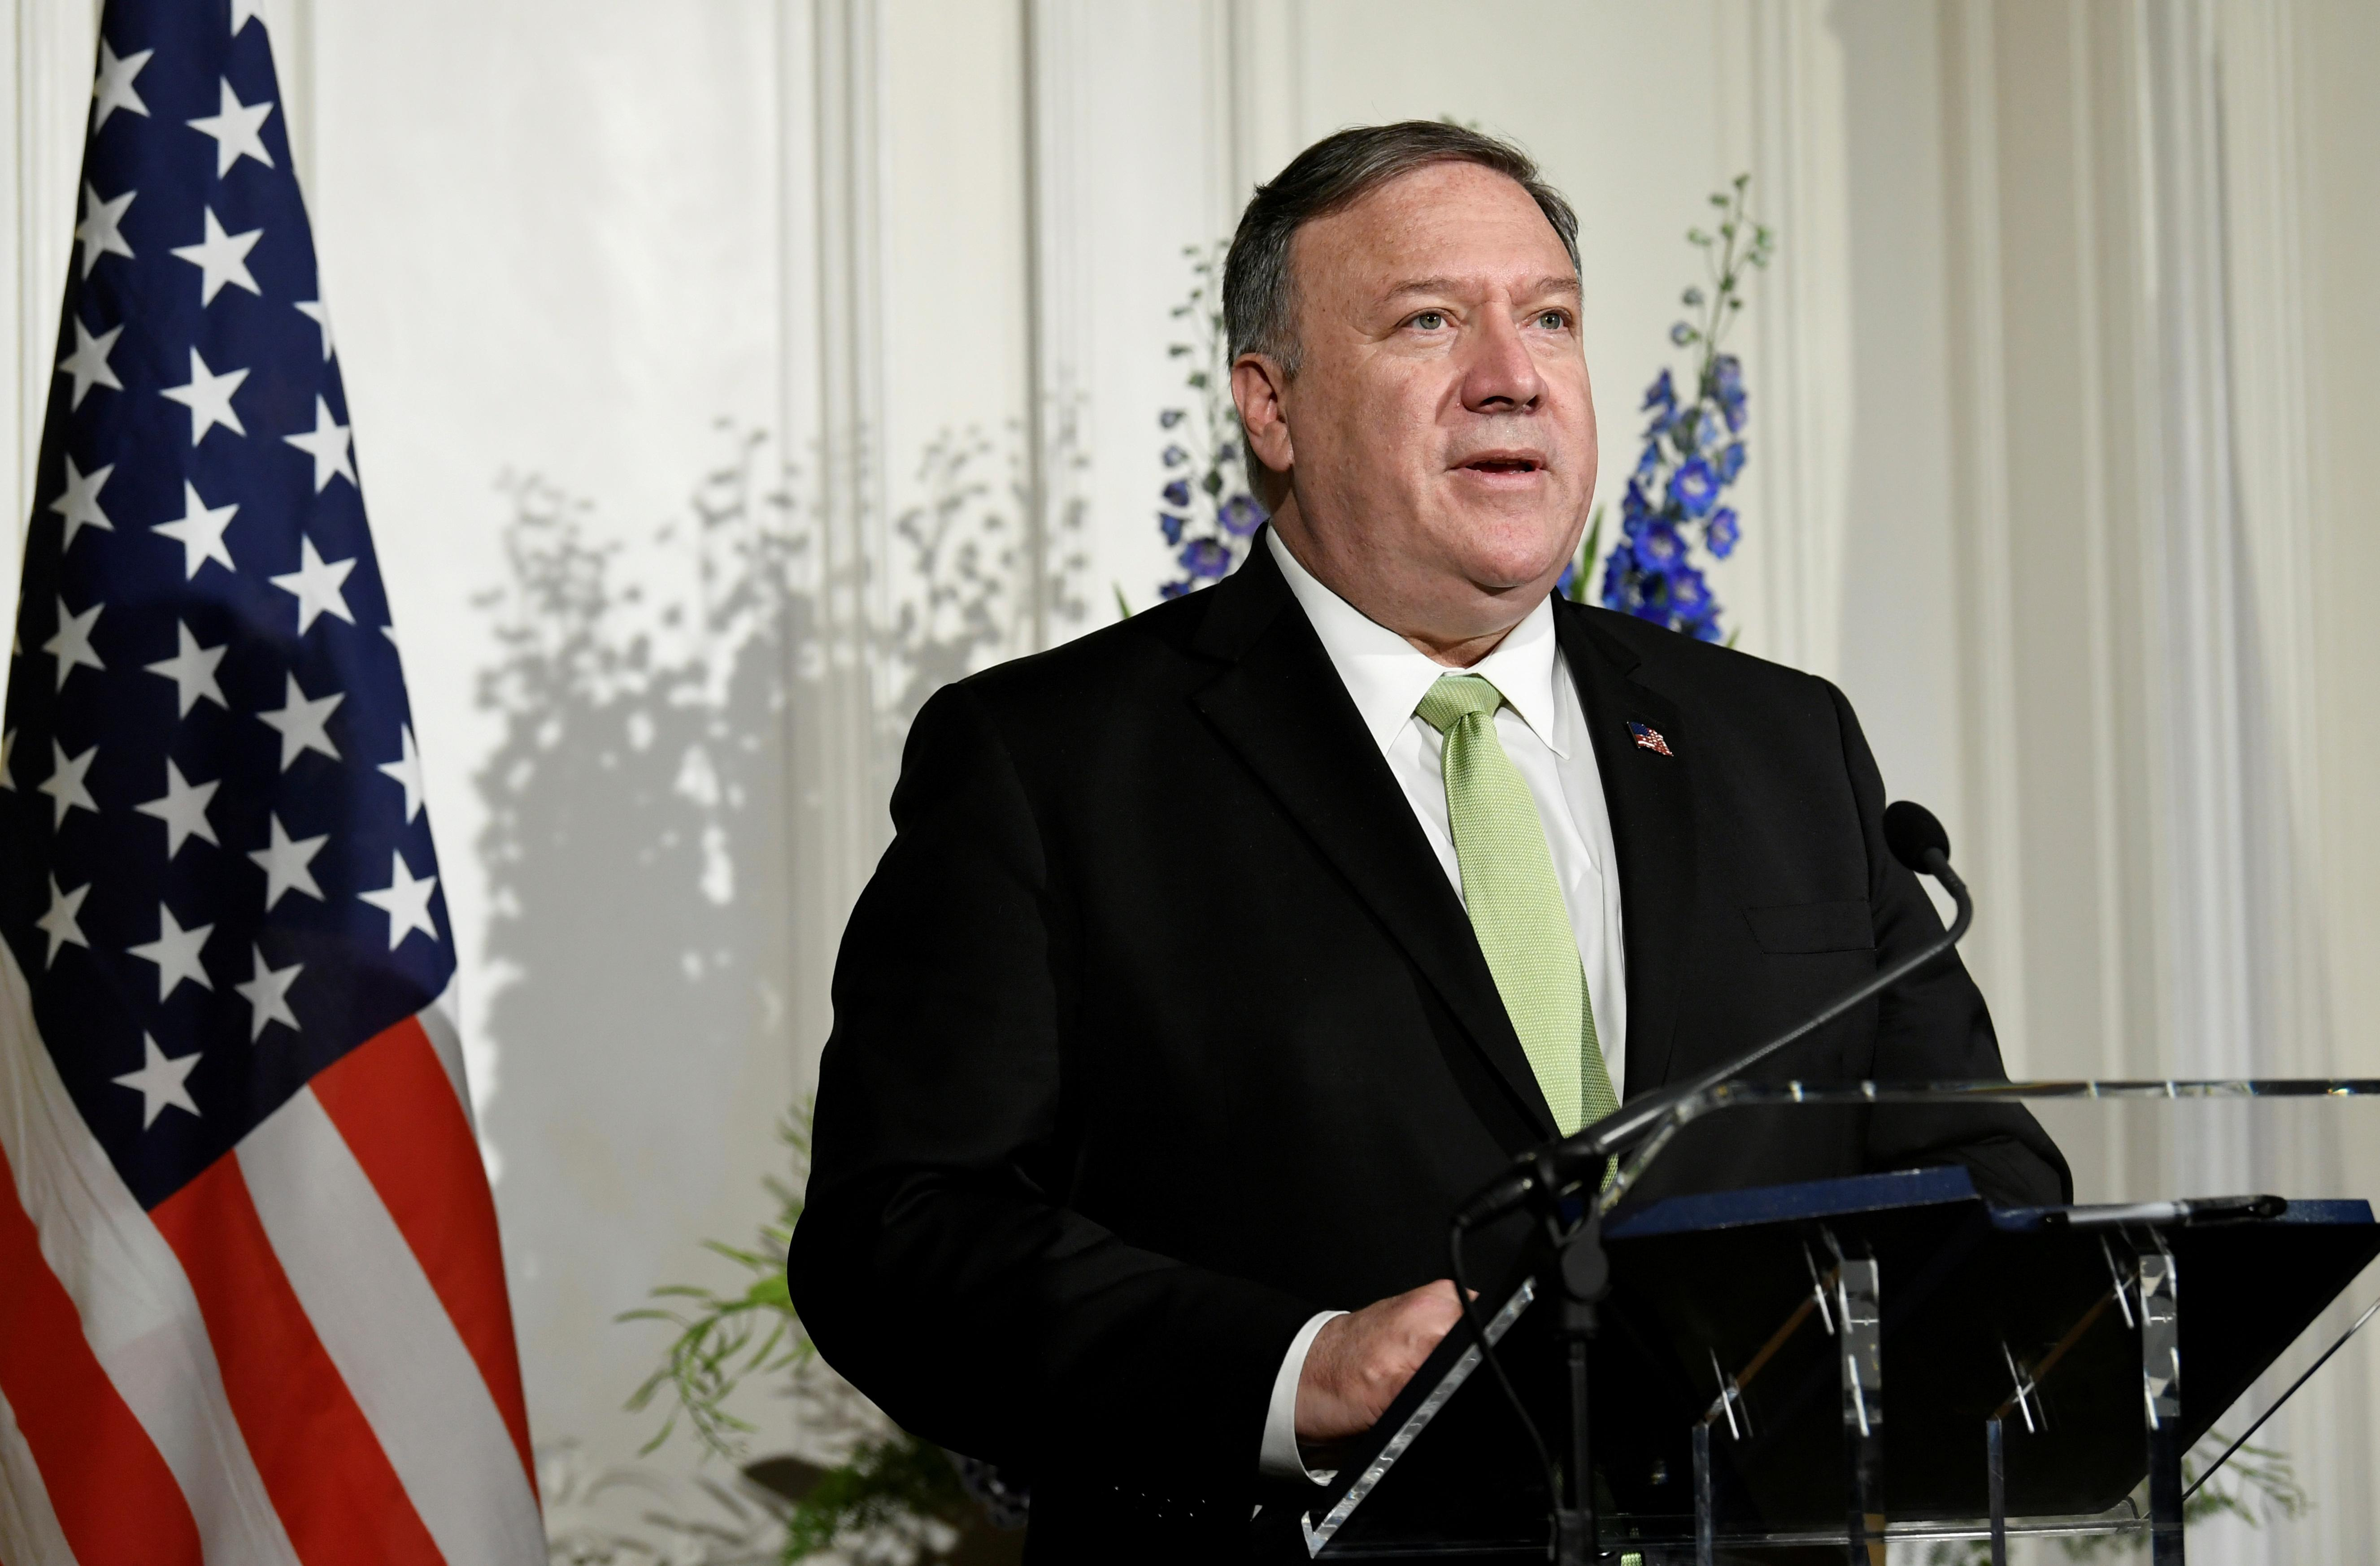 Exclusive: Overruling his experts, Pompeo keeps Saudis off U.S....